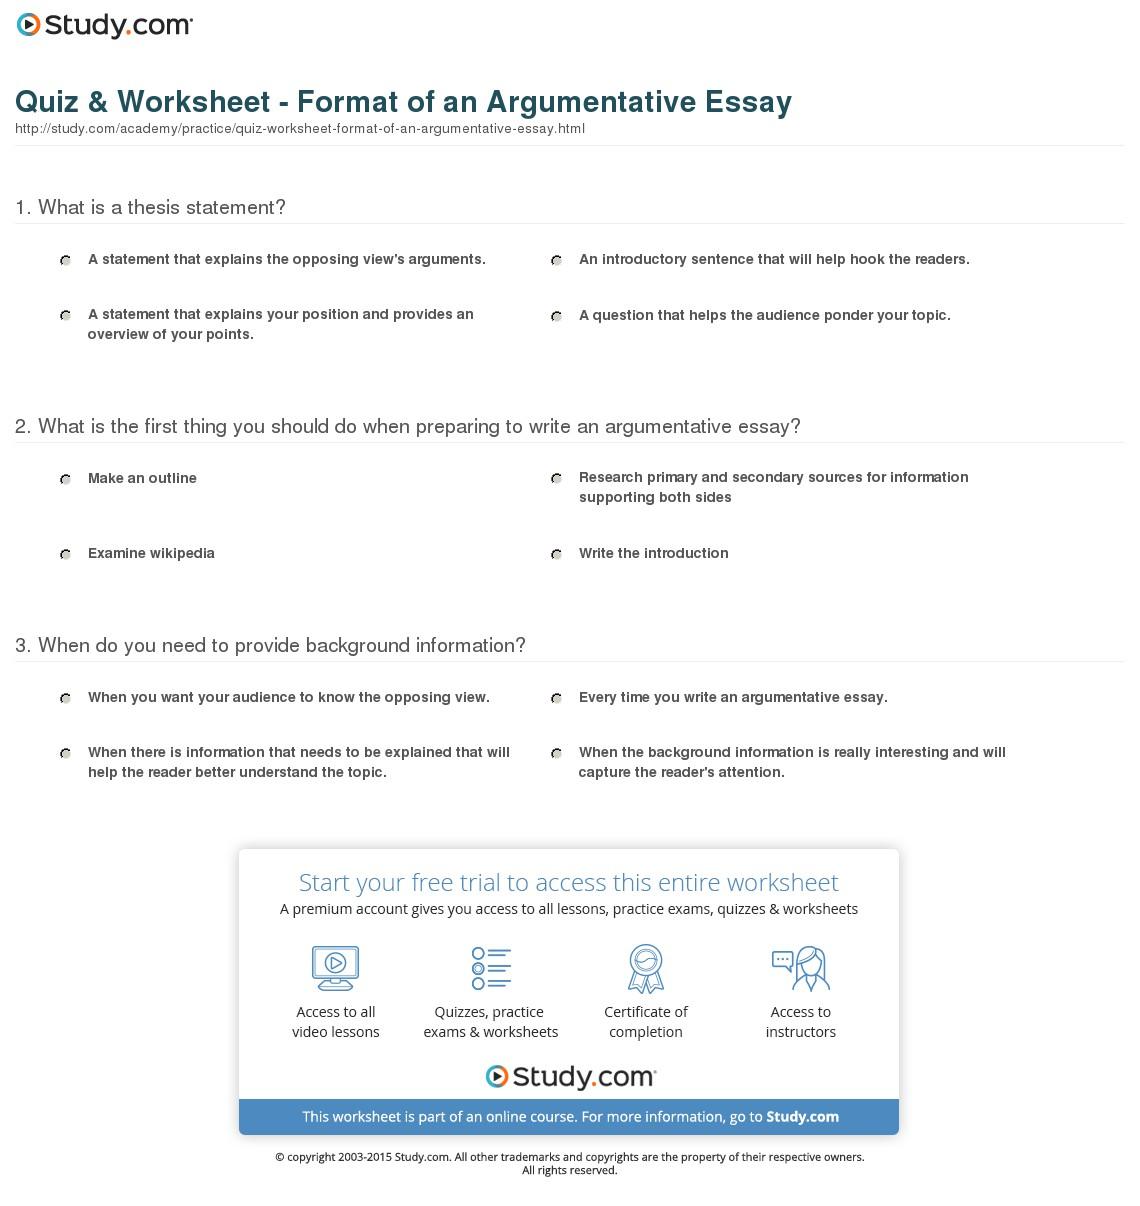 006 Essay Example Of Persuasive Outline Argumentative